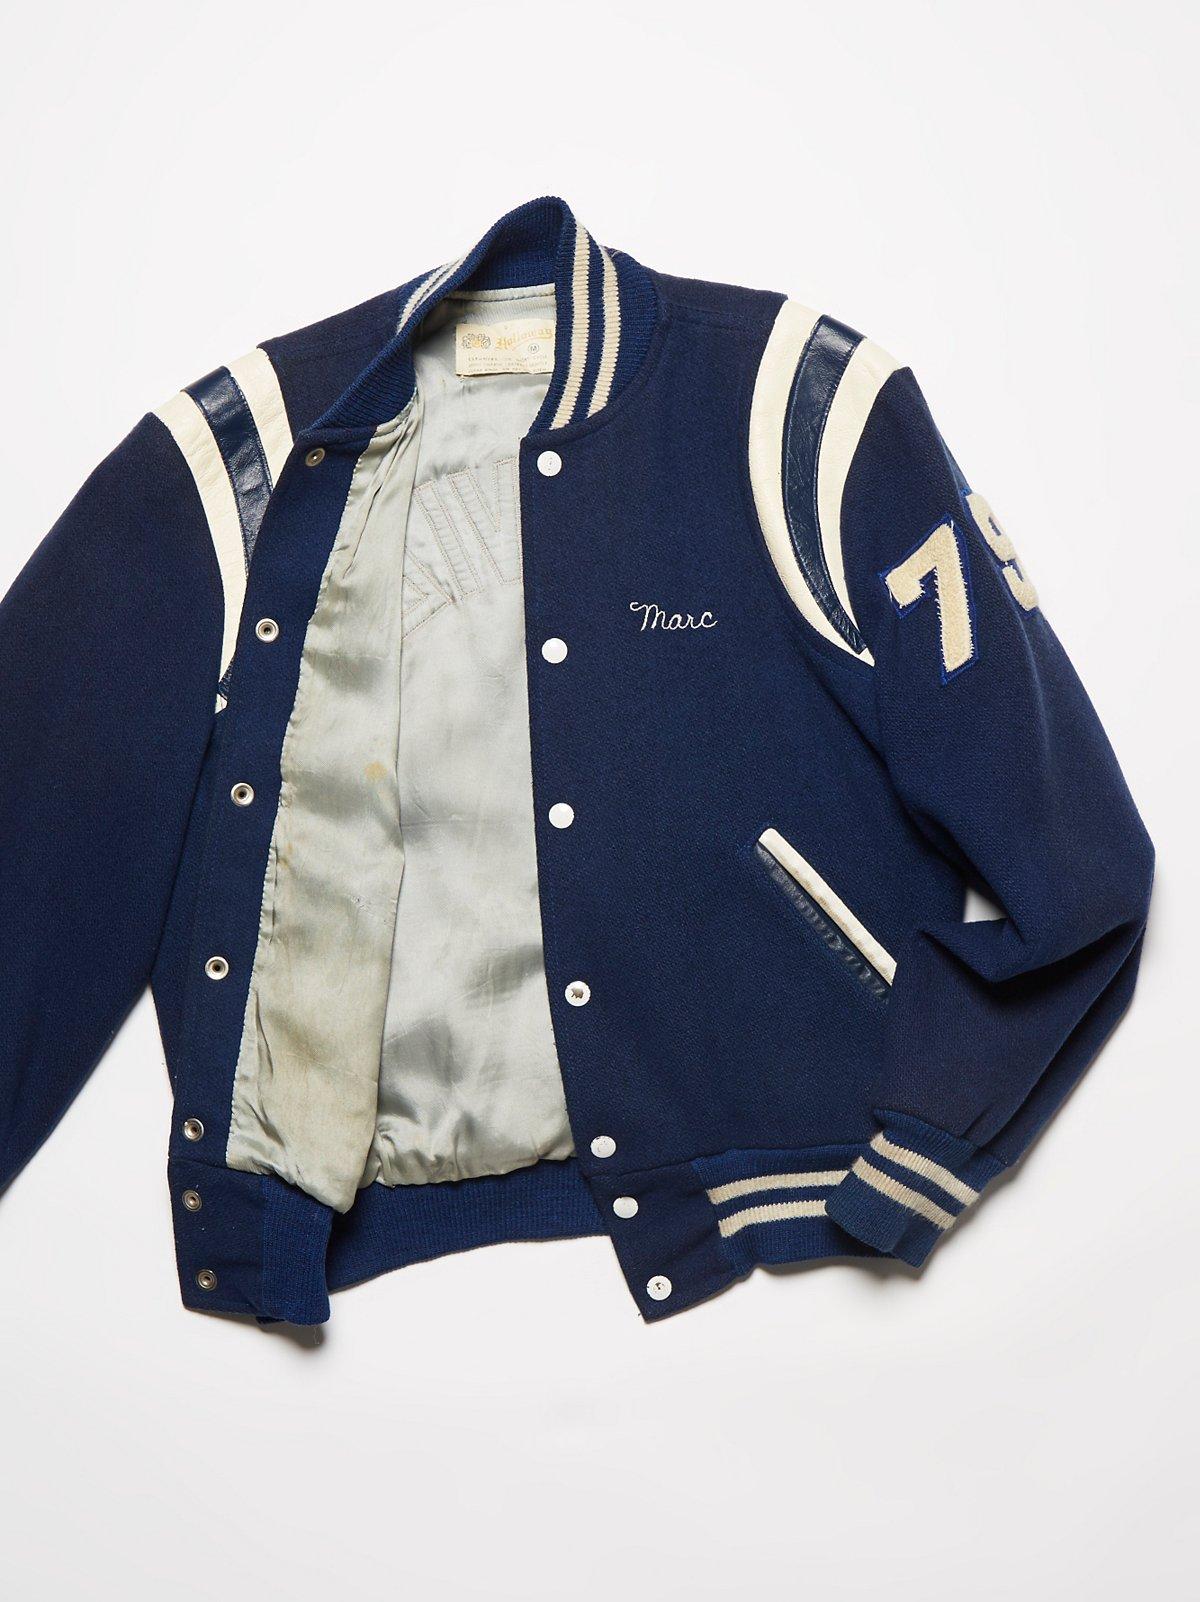 Vintage 1970s Letterman Jacket